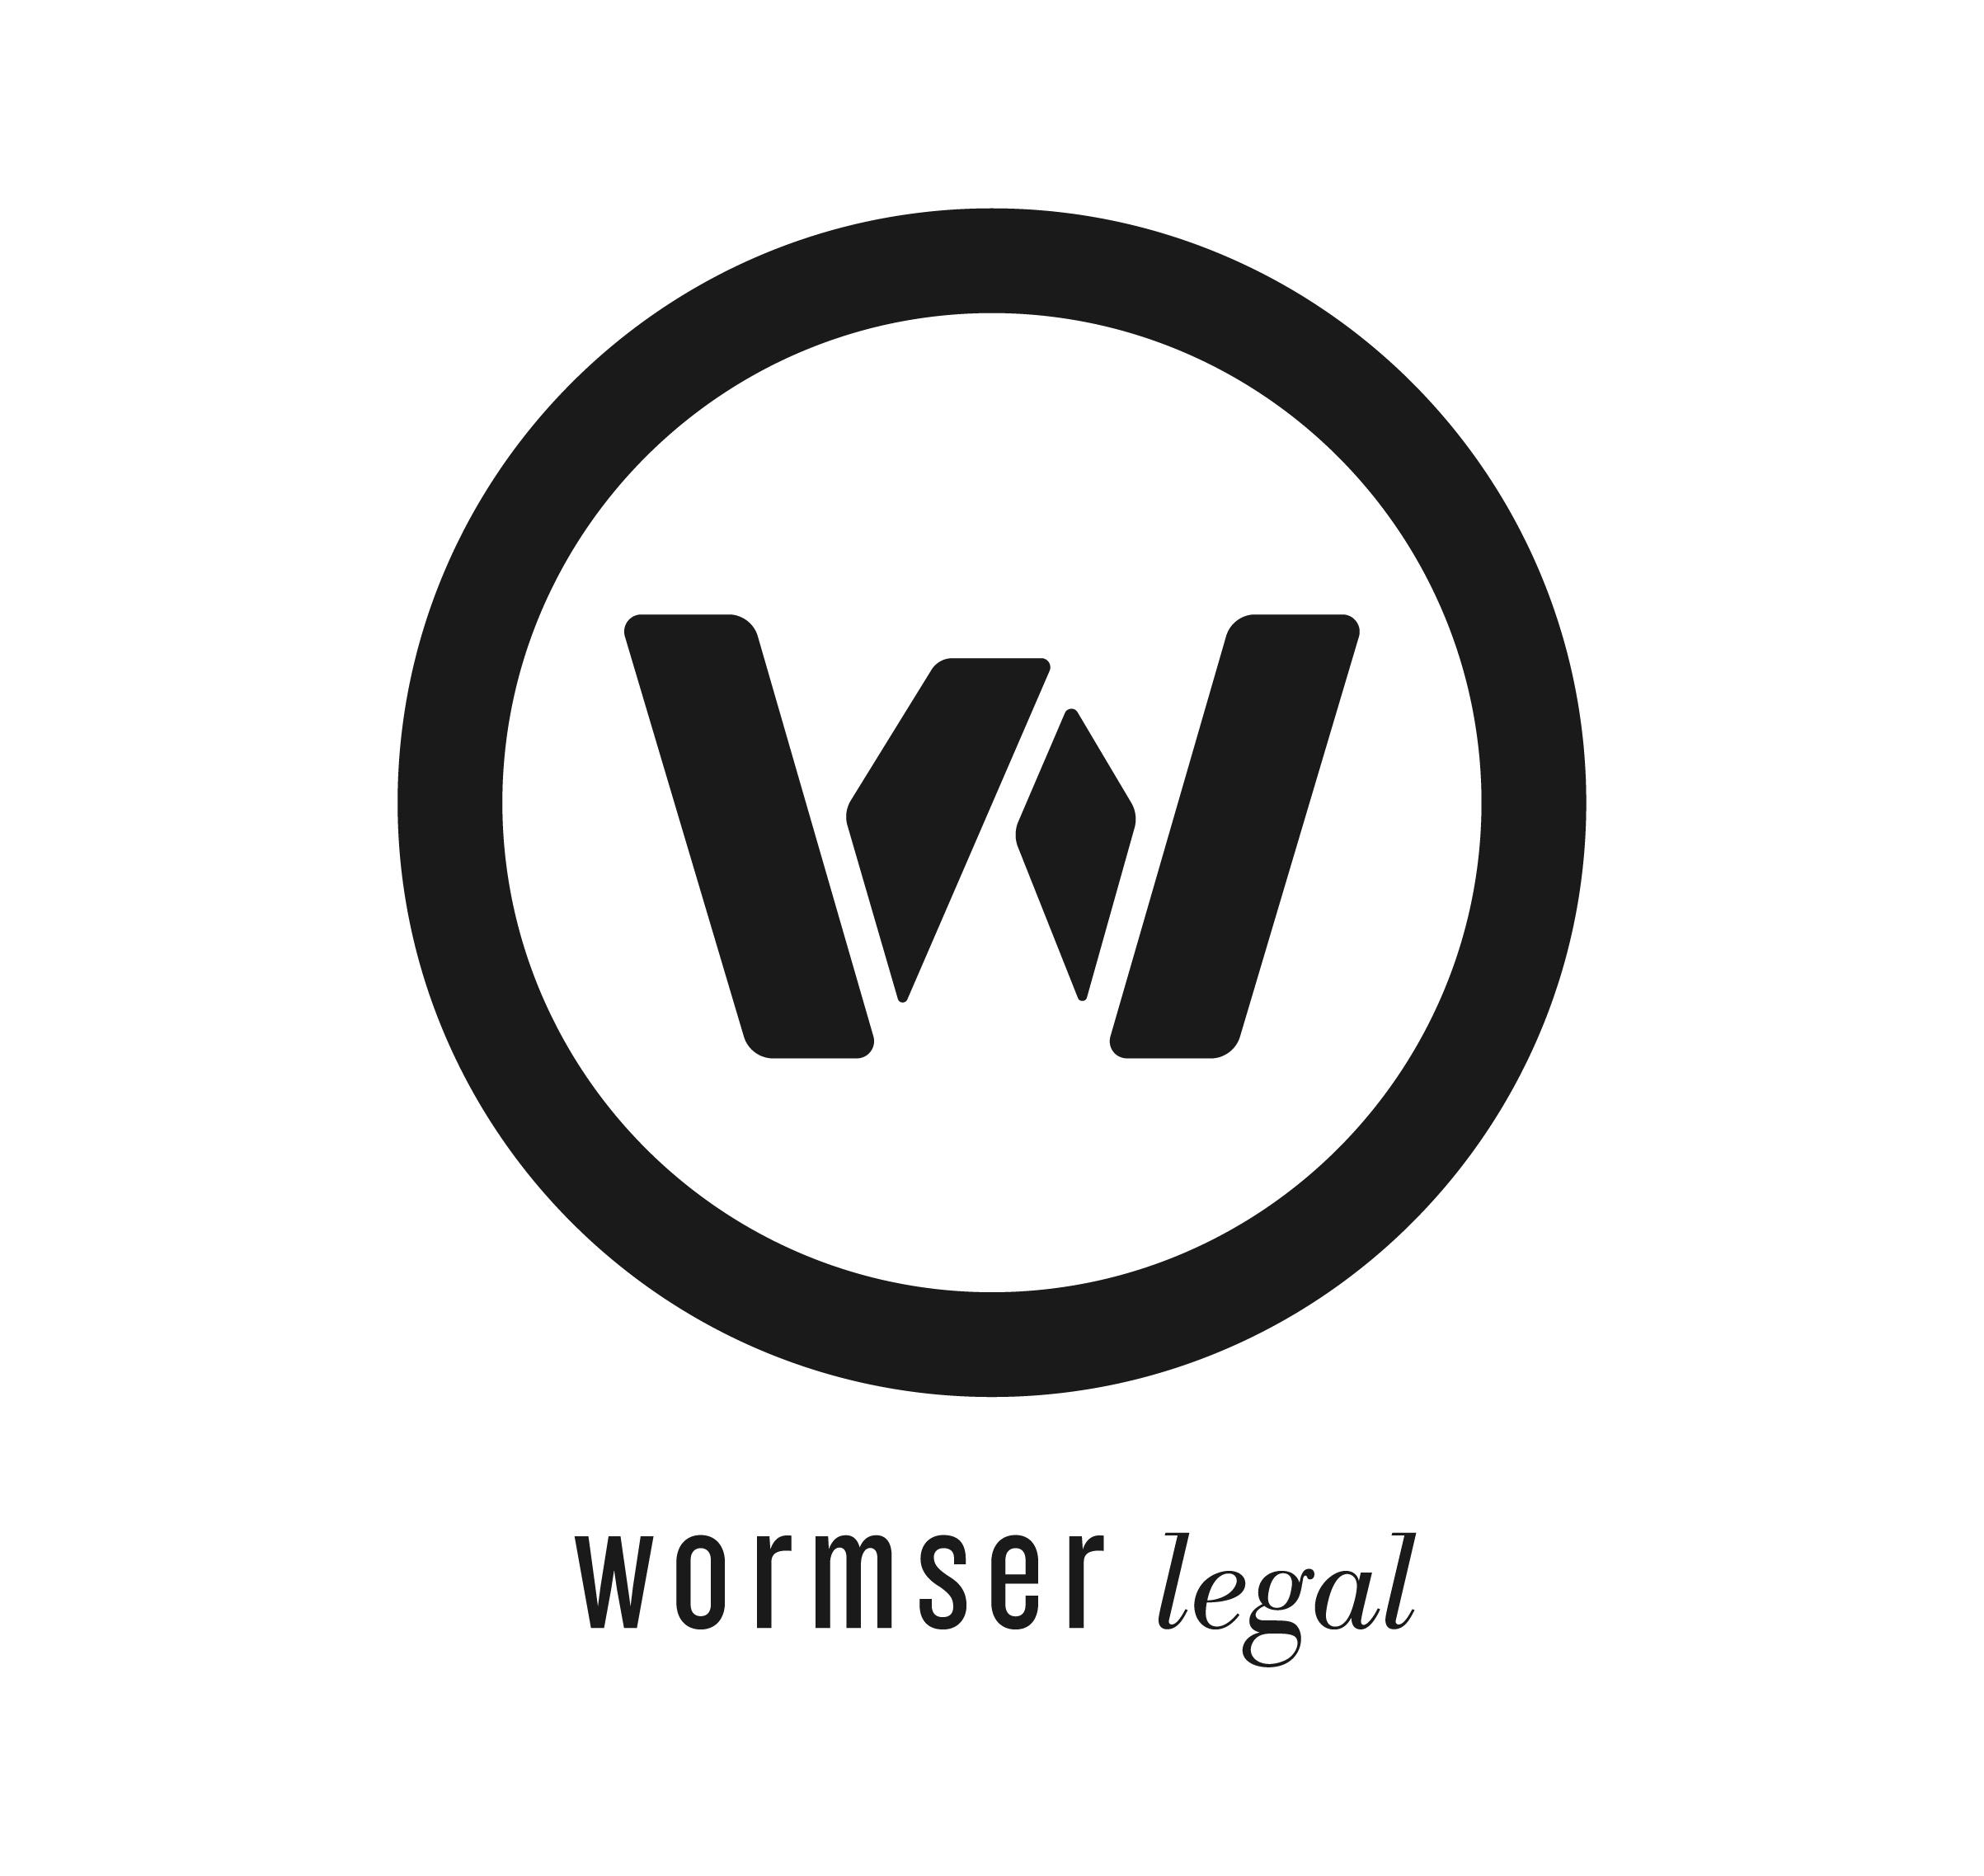 Wormser Legal logo